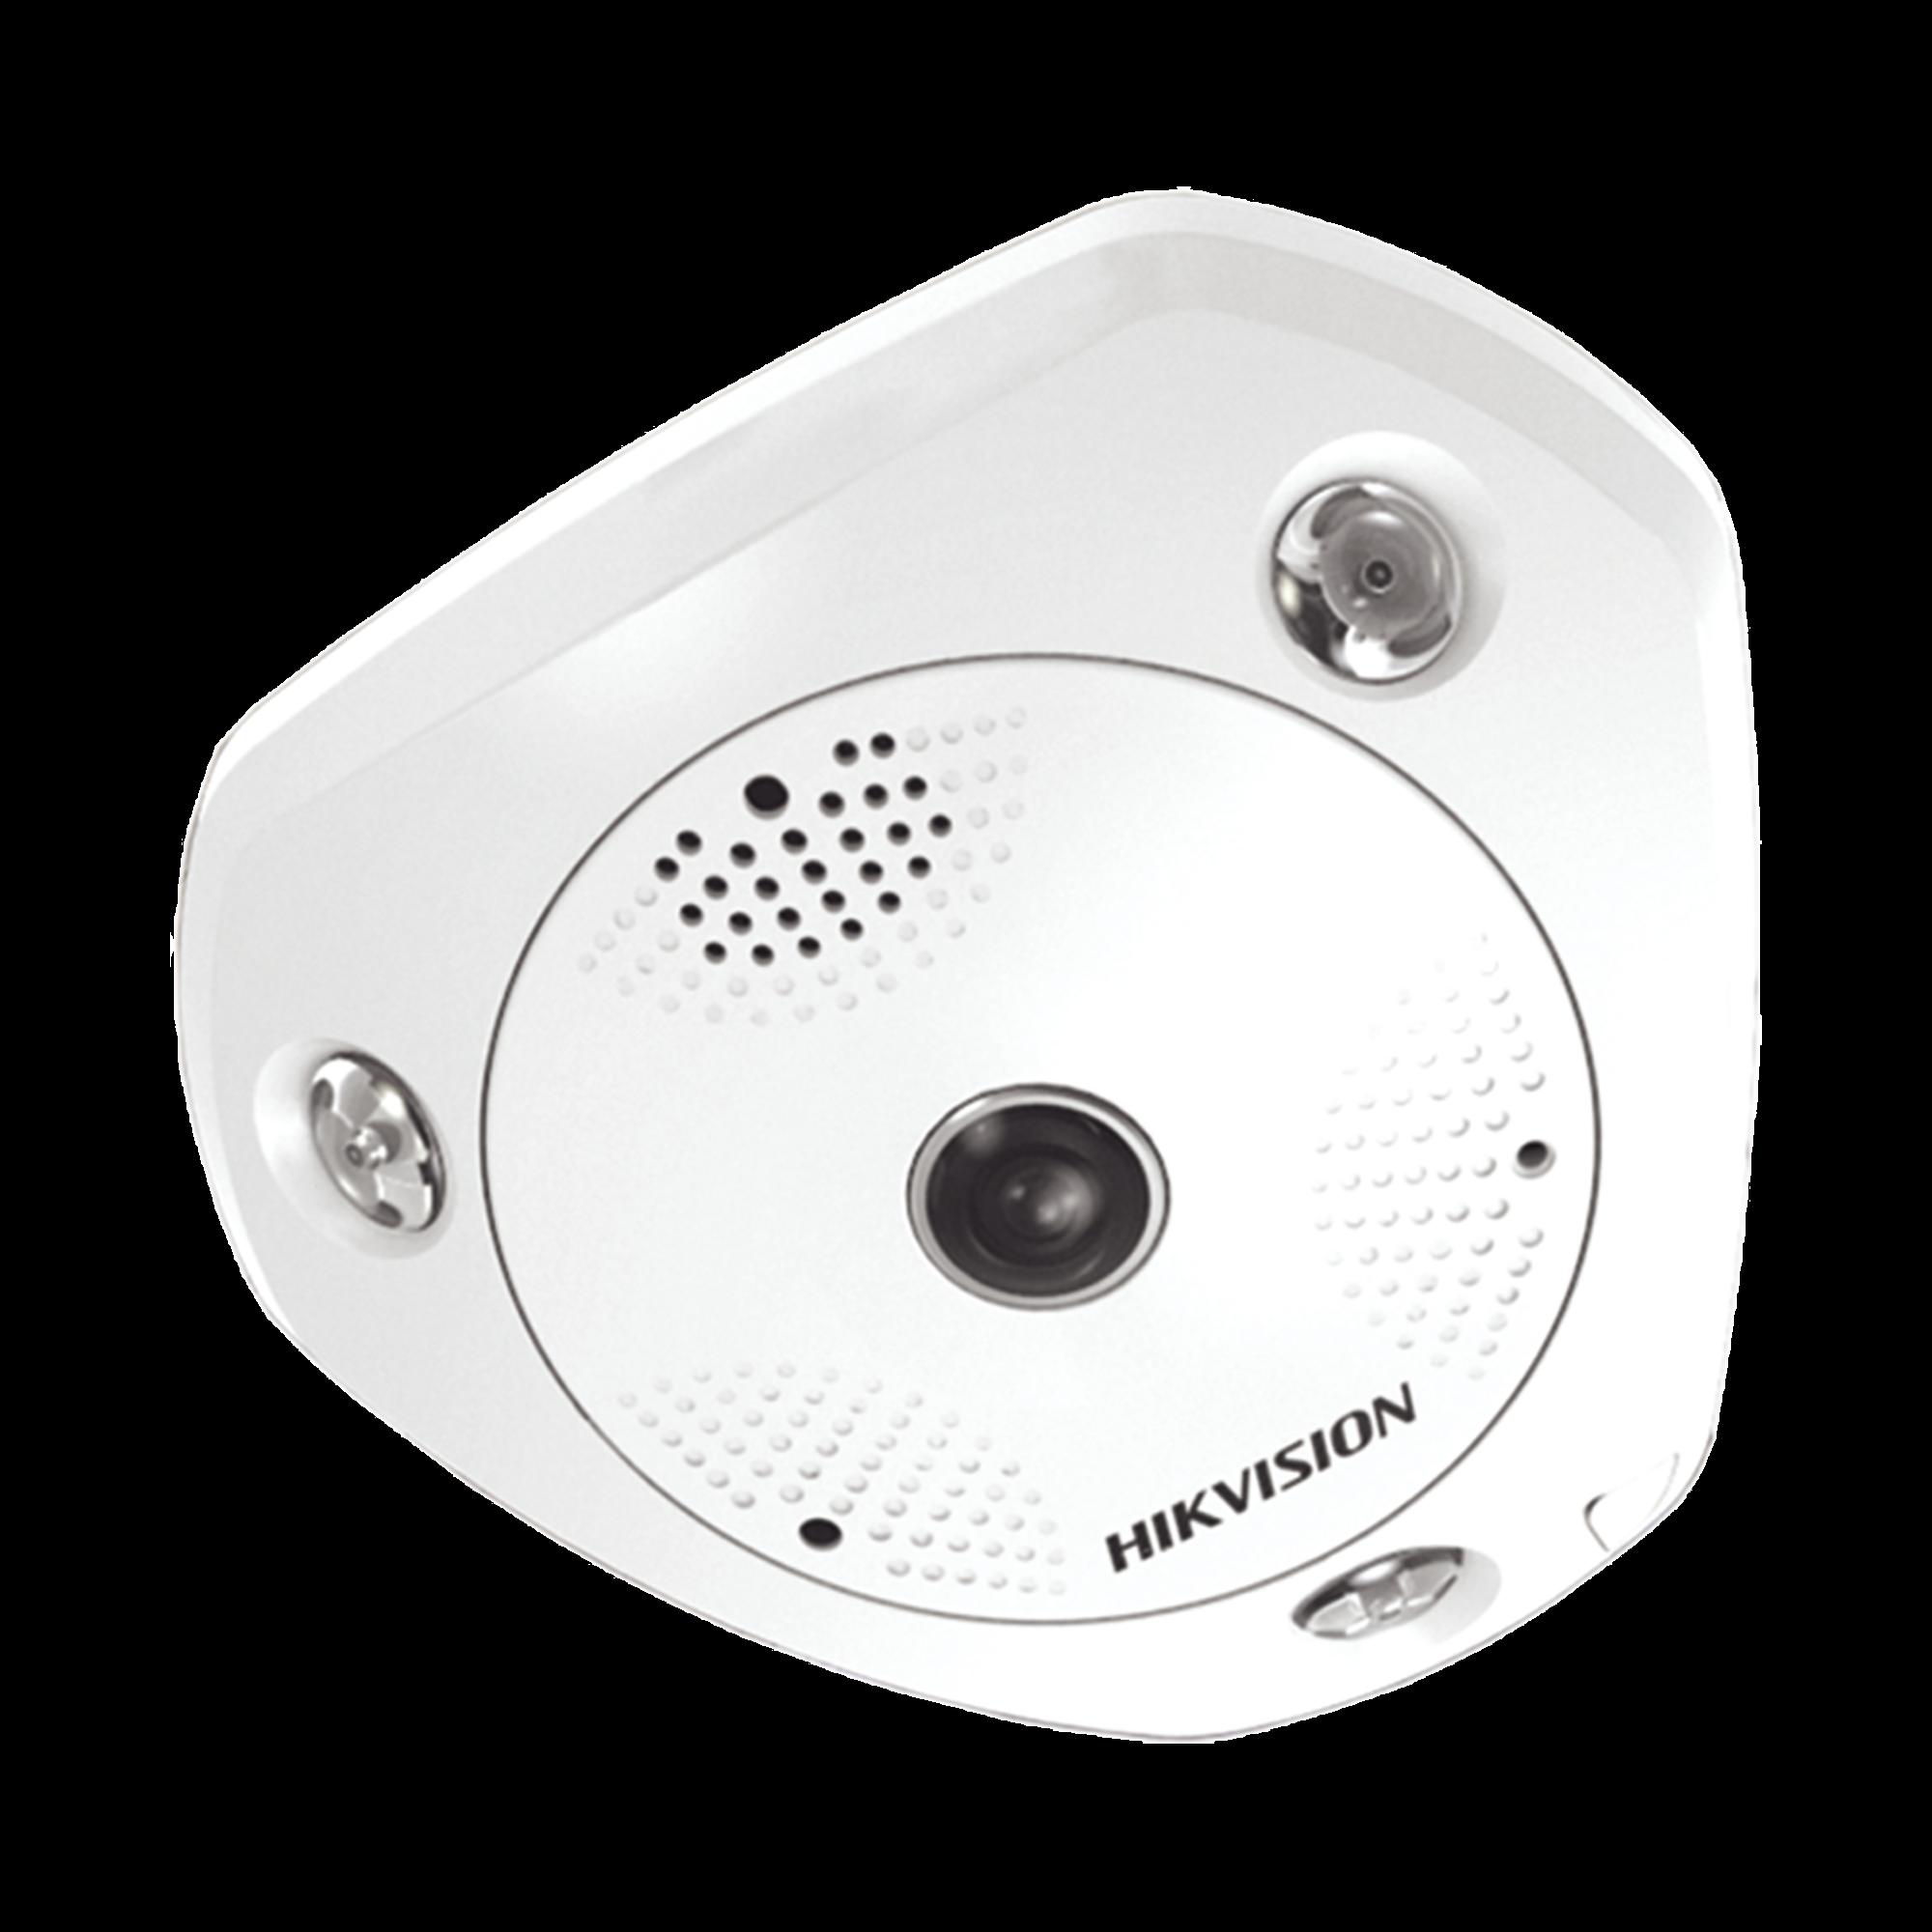 Fisheye IP 3 Megapixel / 180? / 360? / DEWARPING / WDR / 15 mts IR  / PTZ Digital / Heat Map / Entrada-Salida audio y alarma / Múltiples vistas / IP66 / IK10 / PoE